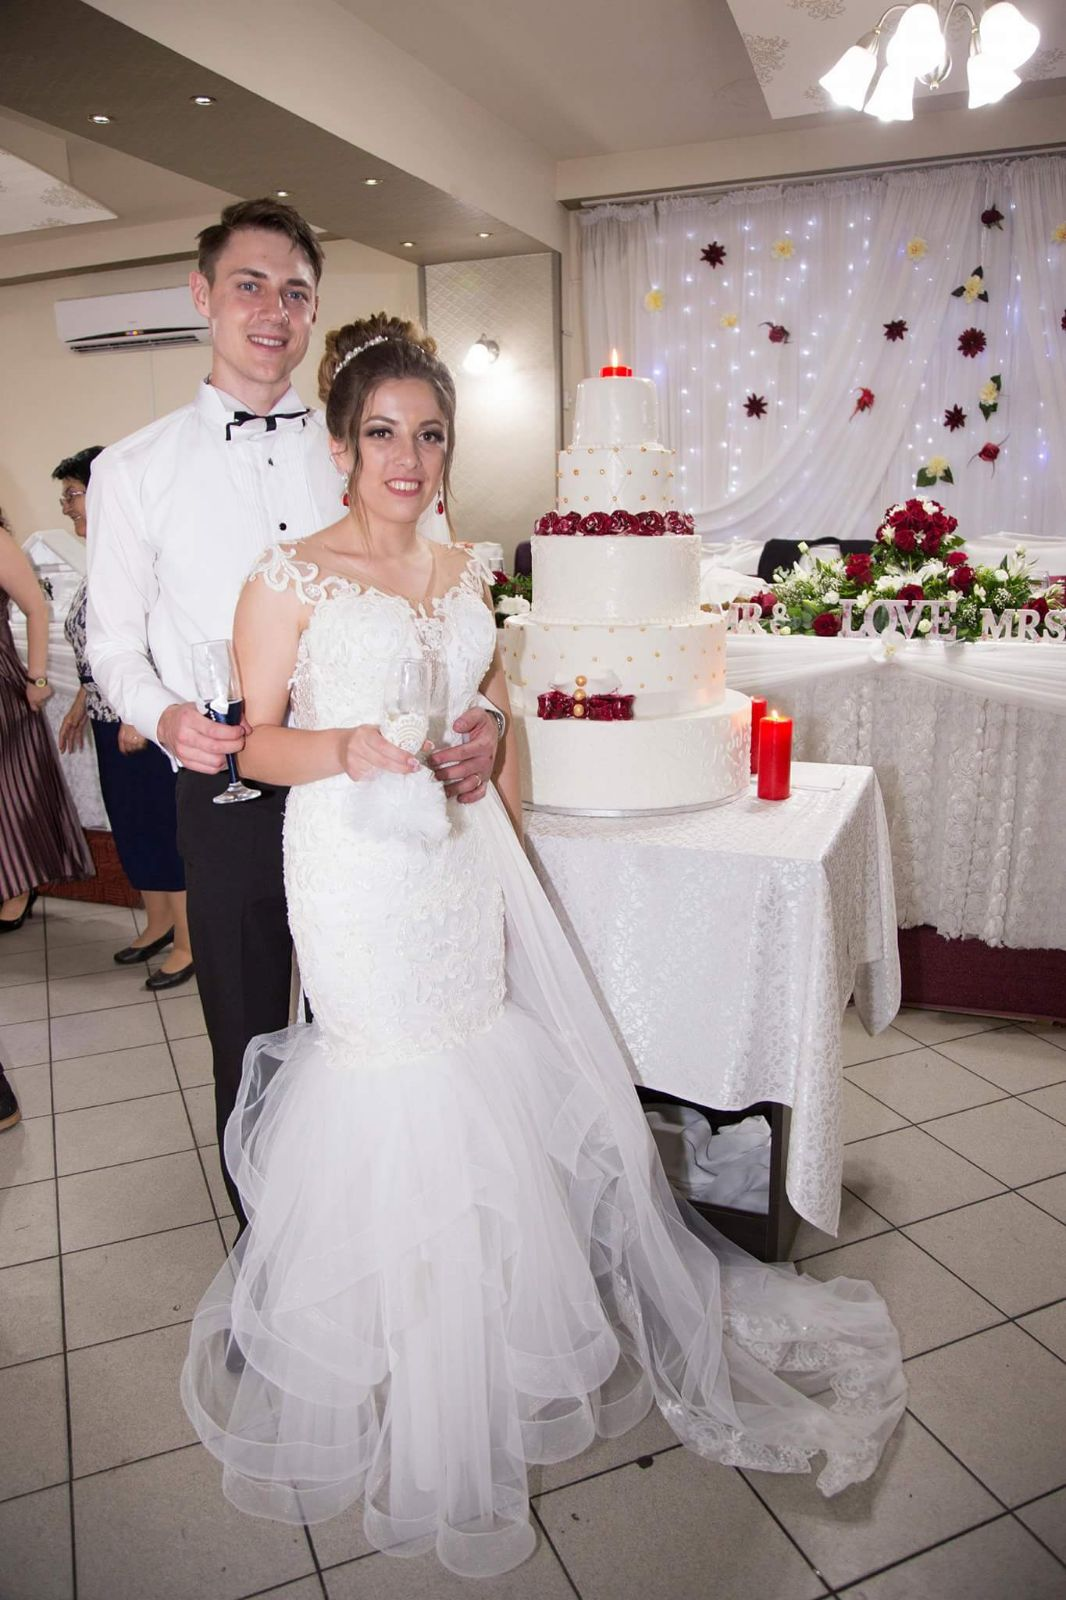 ancuta adora rochia de mireasa 5 in 1 (25)